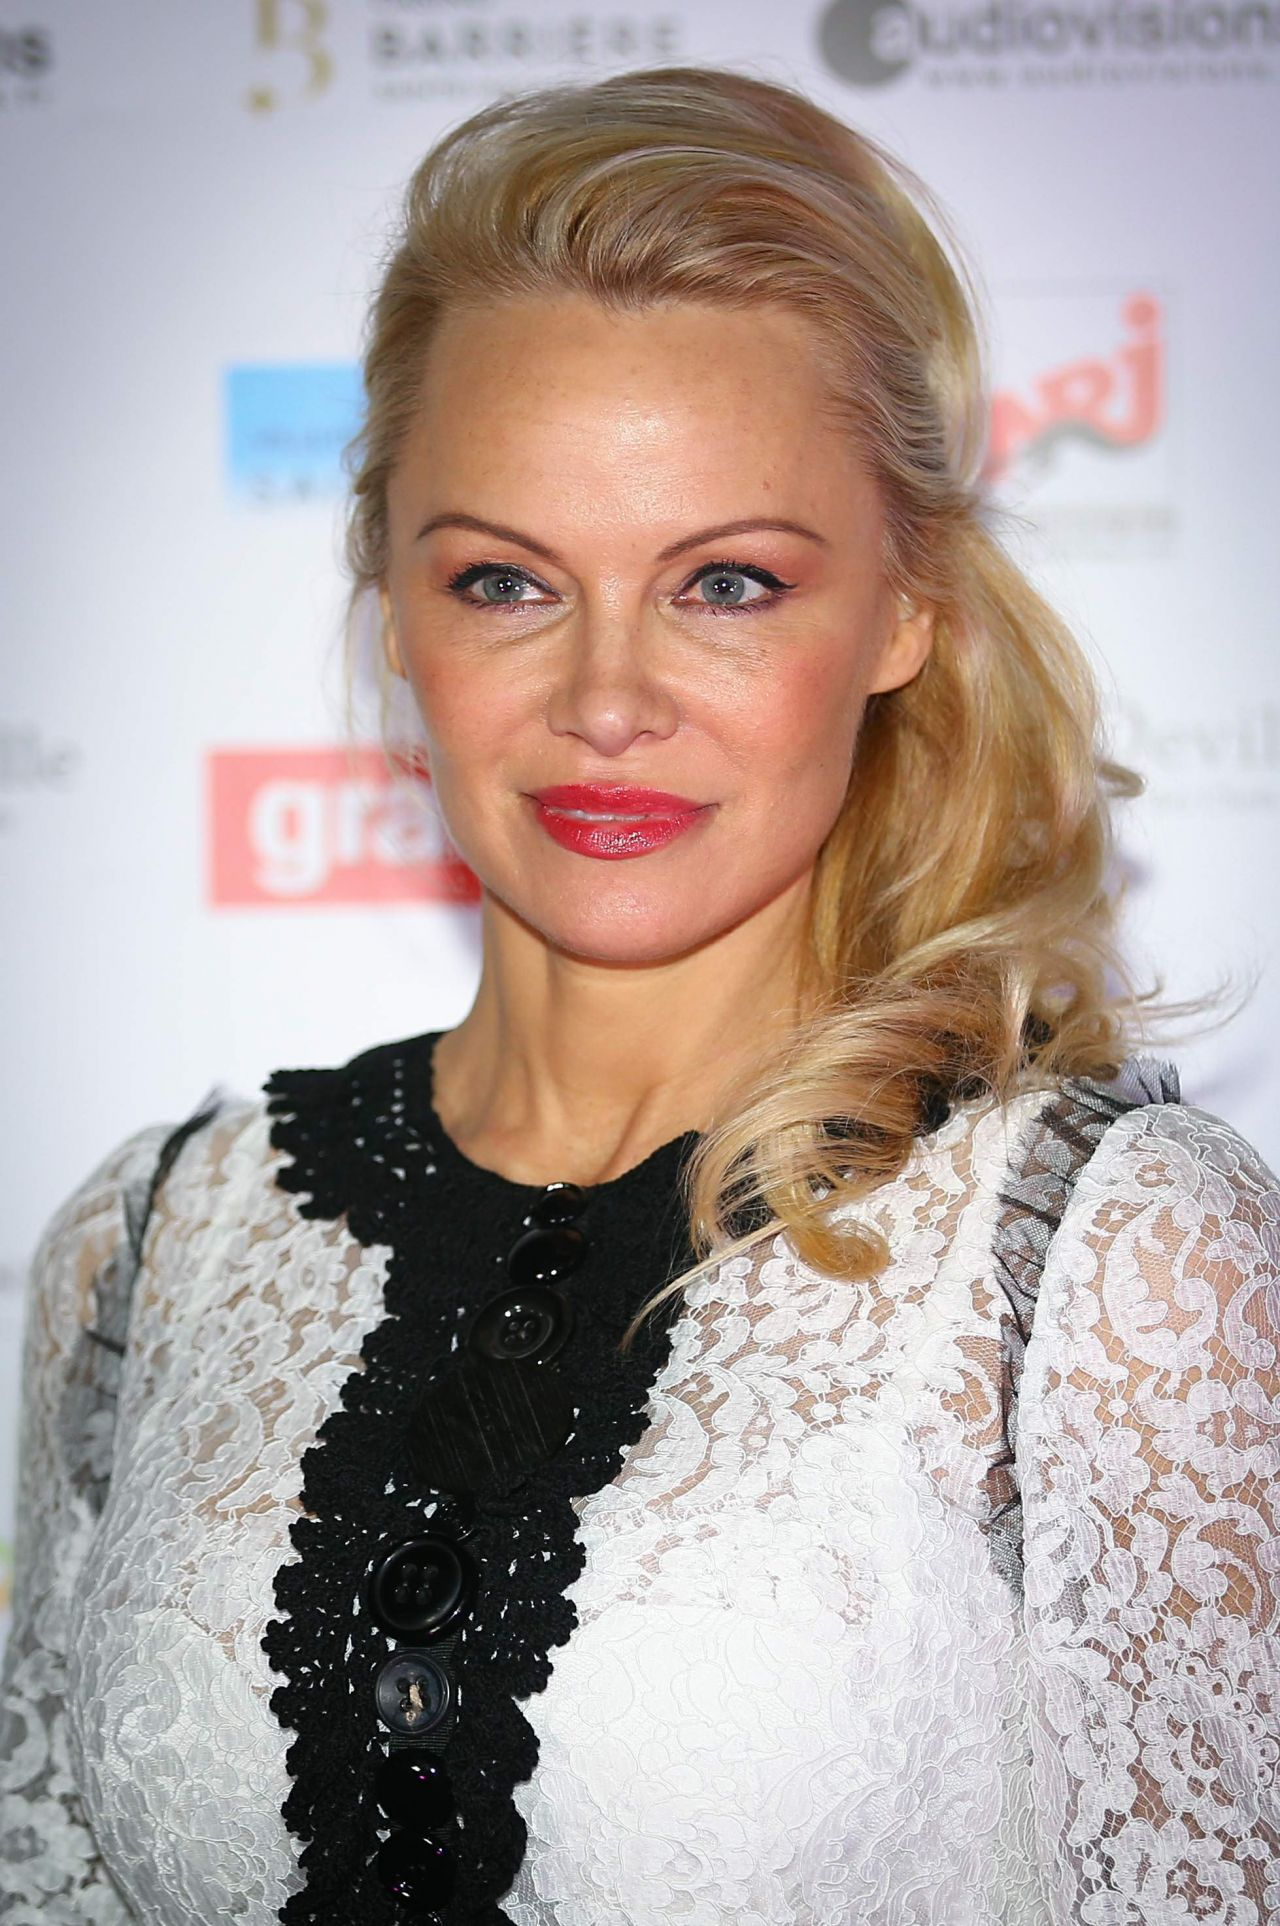 Pamela Anderson - Pamela Anderson Foundation Gala in ... Pamela Anderson